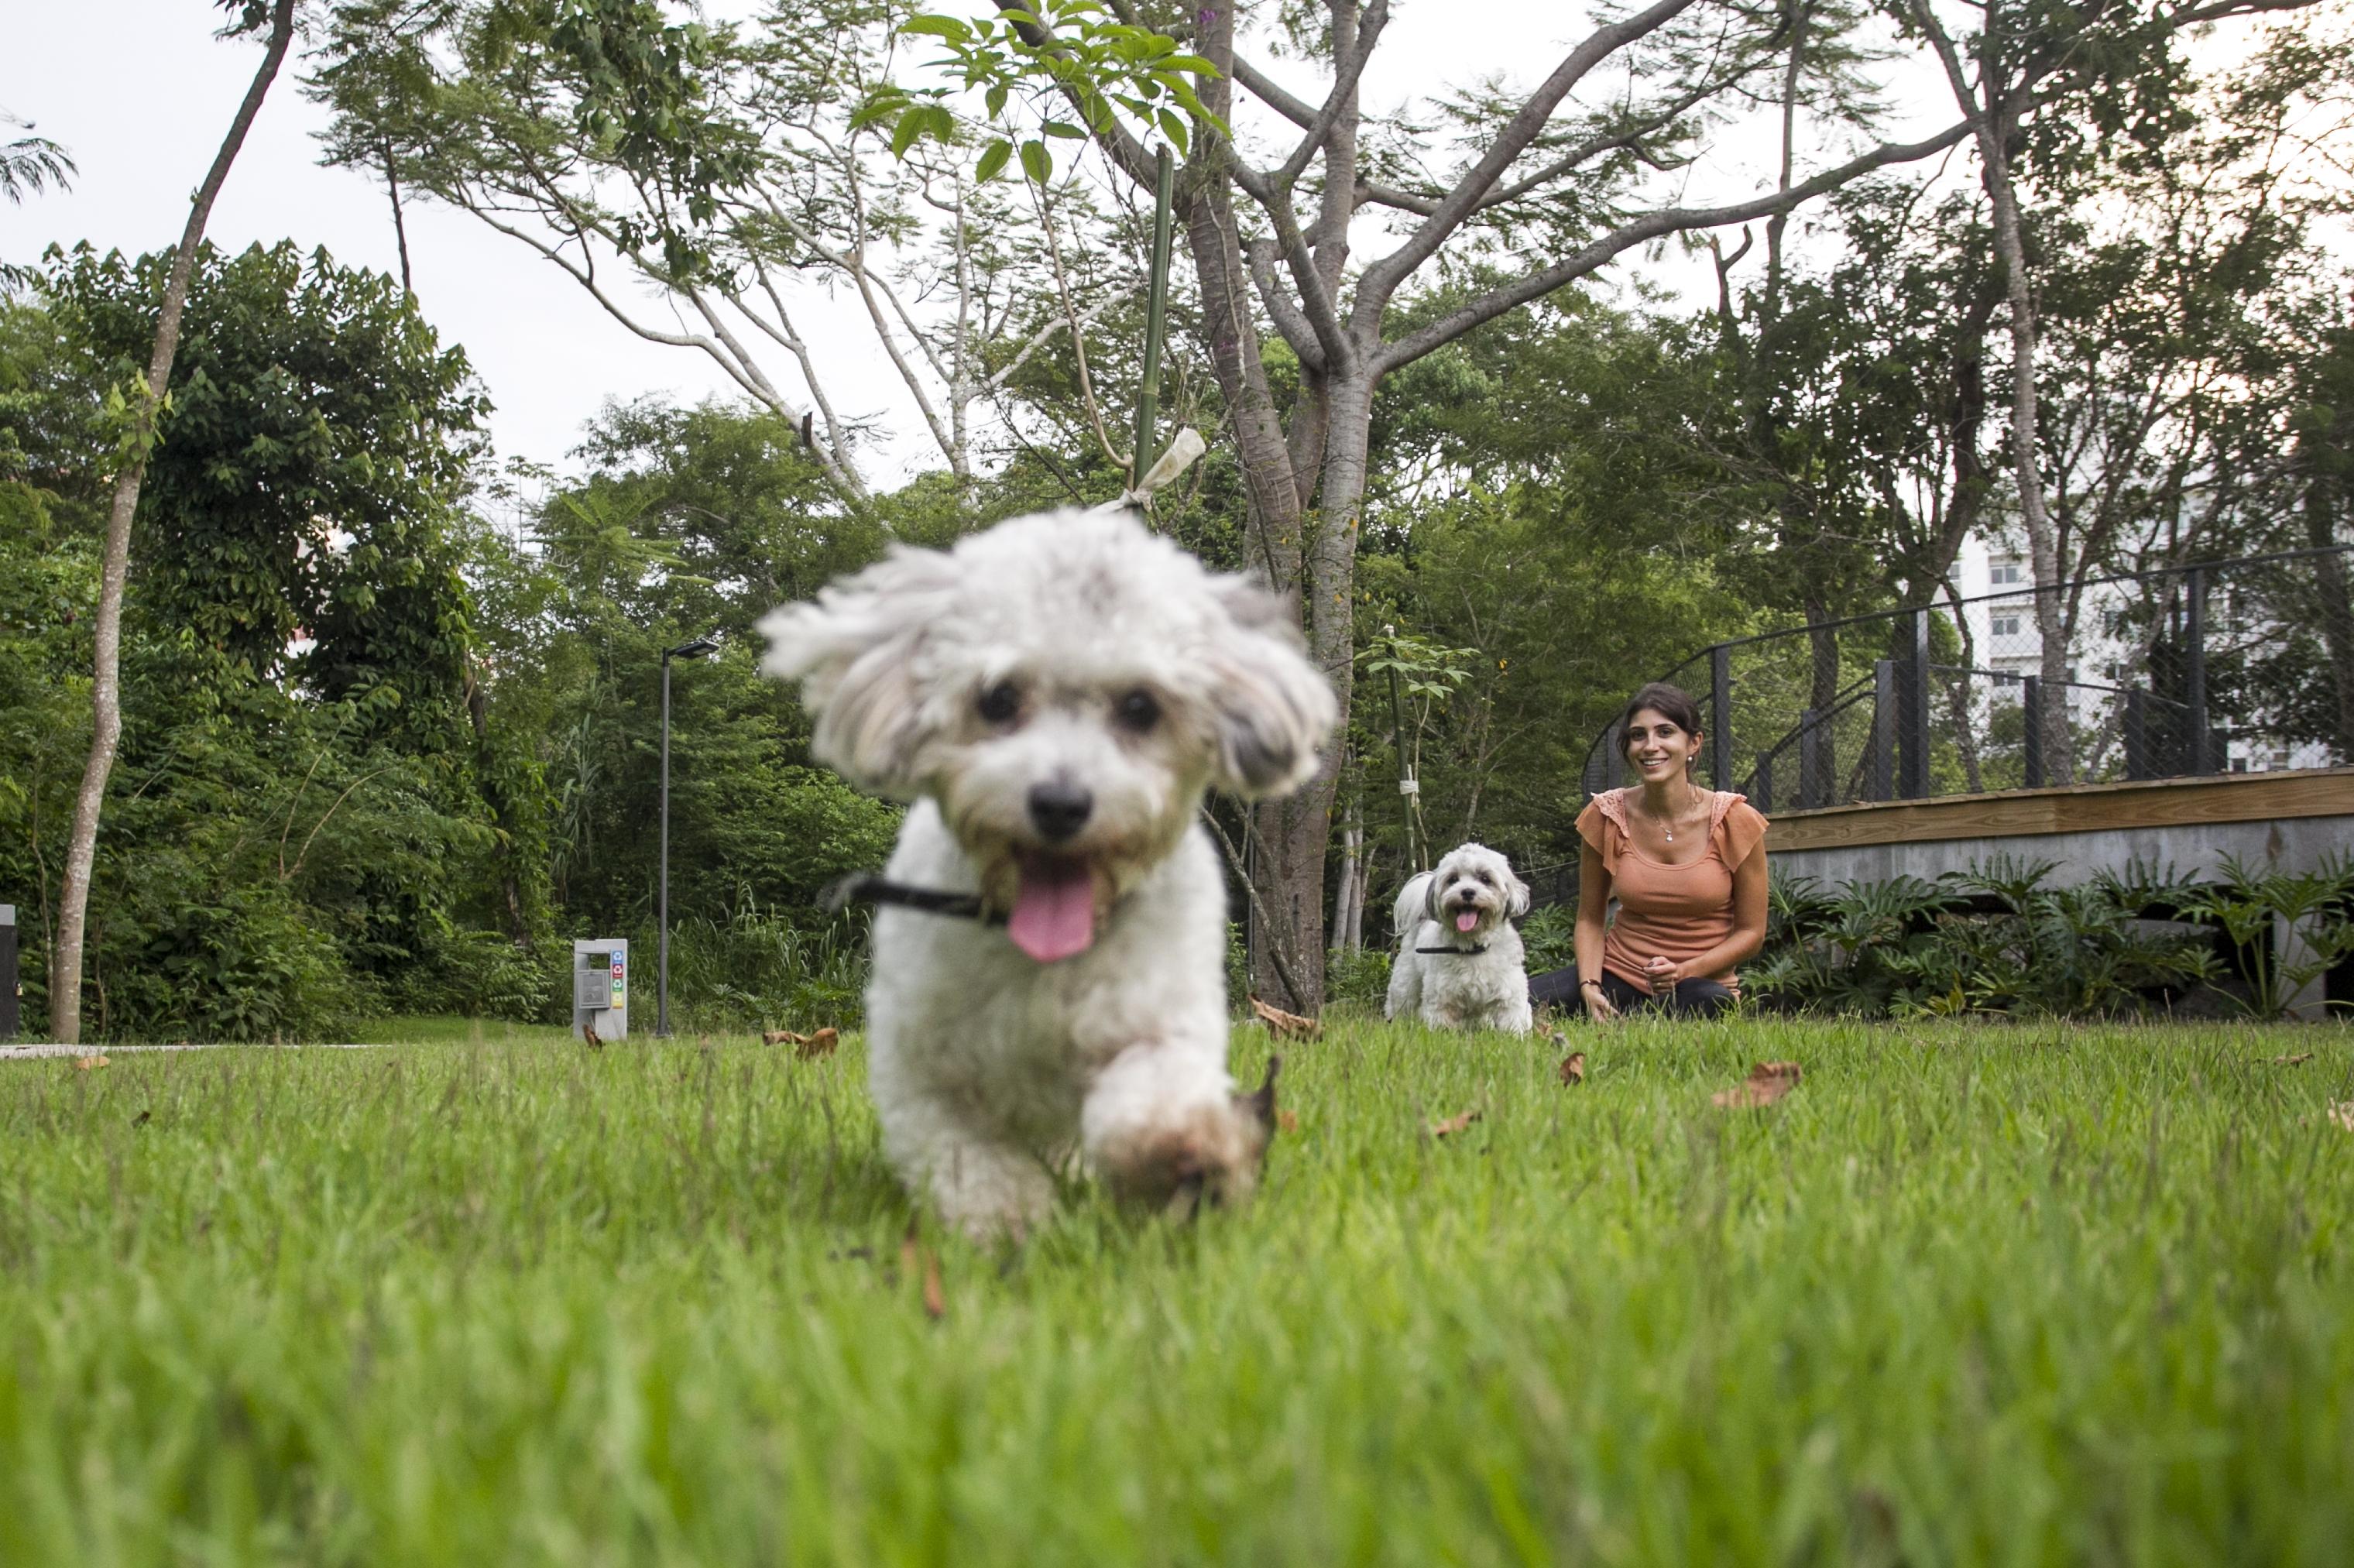 Laíse Orsi leva diariamente as cachorrinhas Luna e Lupita para passear no Parque Linear do Córrego Grande - Marco Santiago/ND